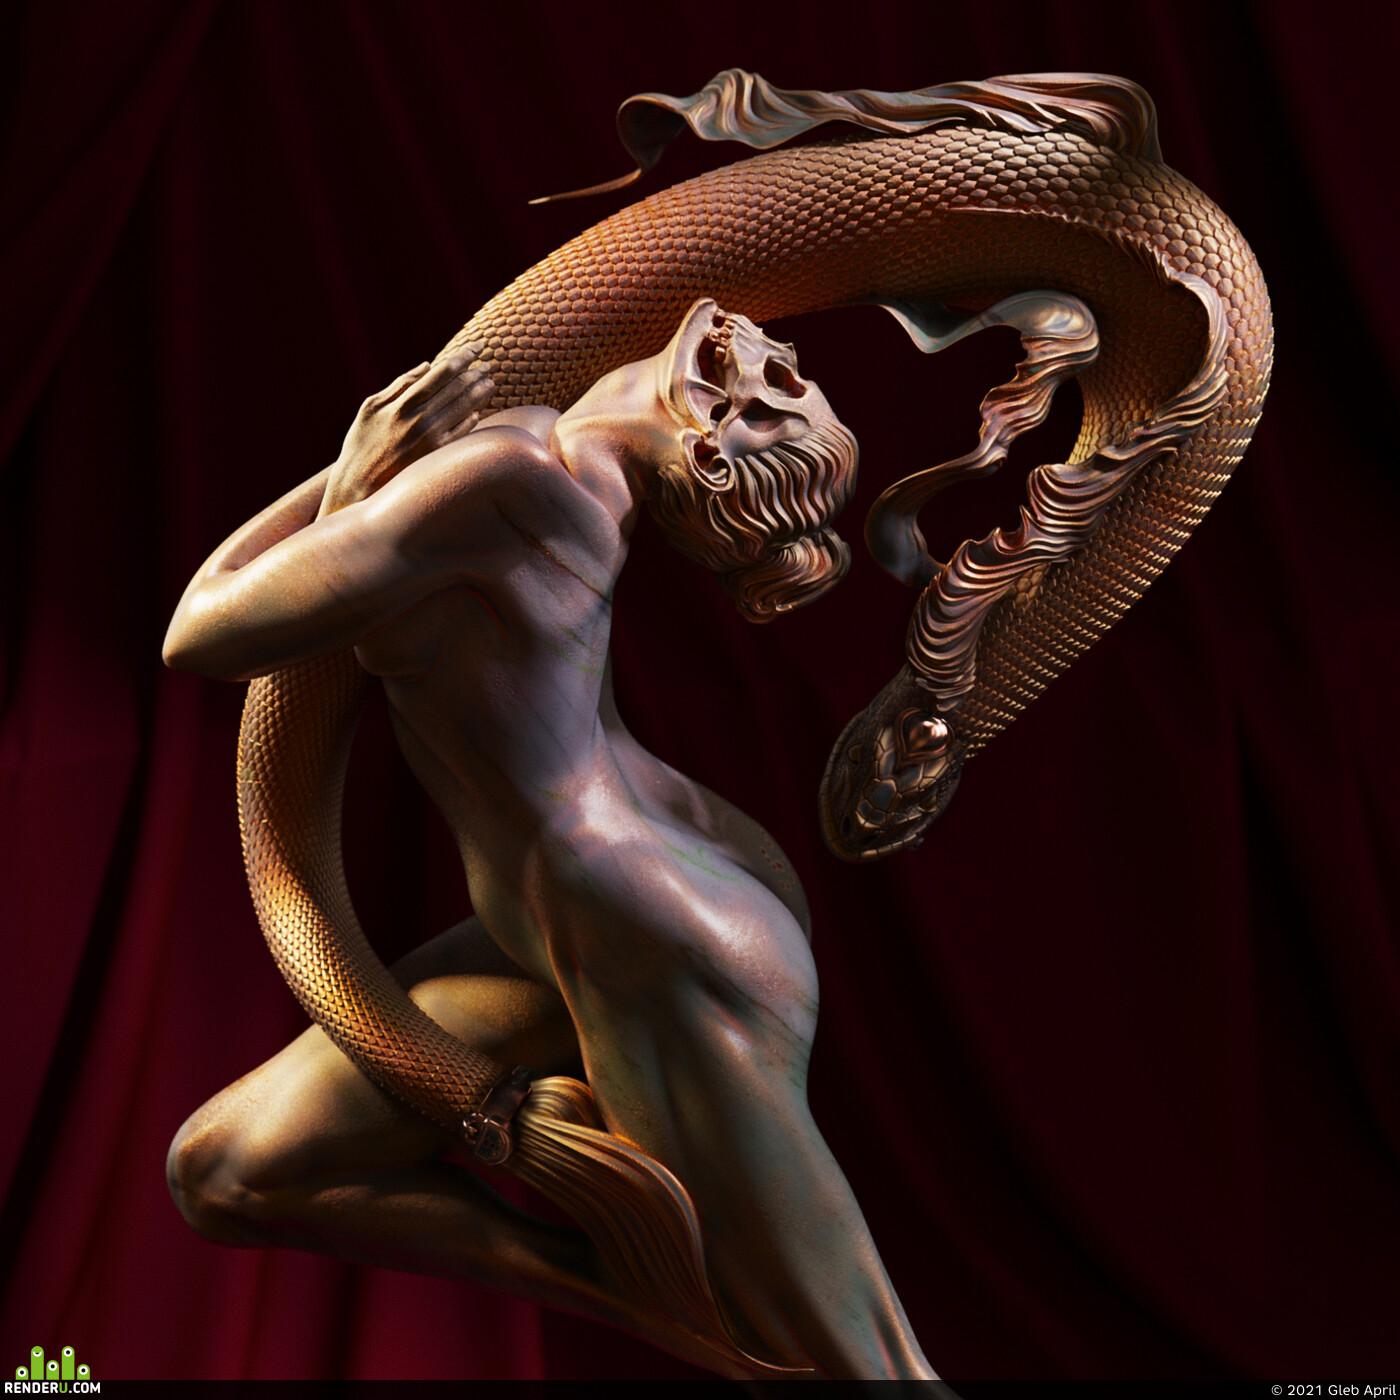 digital sculpture, 3d_sculpture, Sculpture Zbrush, zbrushsculpt, digital sculpt, 3d sculpt, 3dsculpting, anatomy female, female, head study